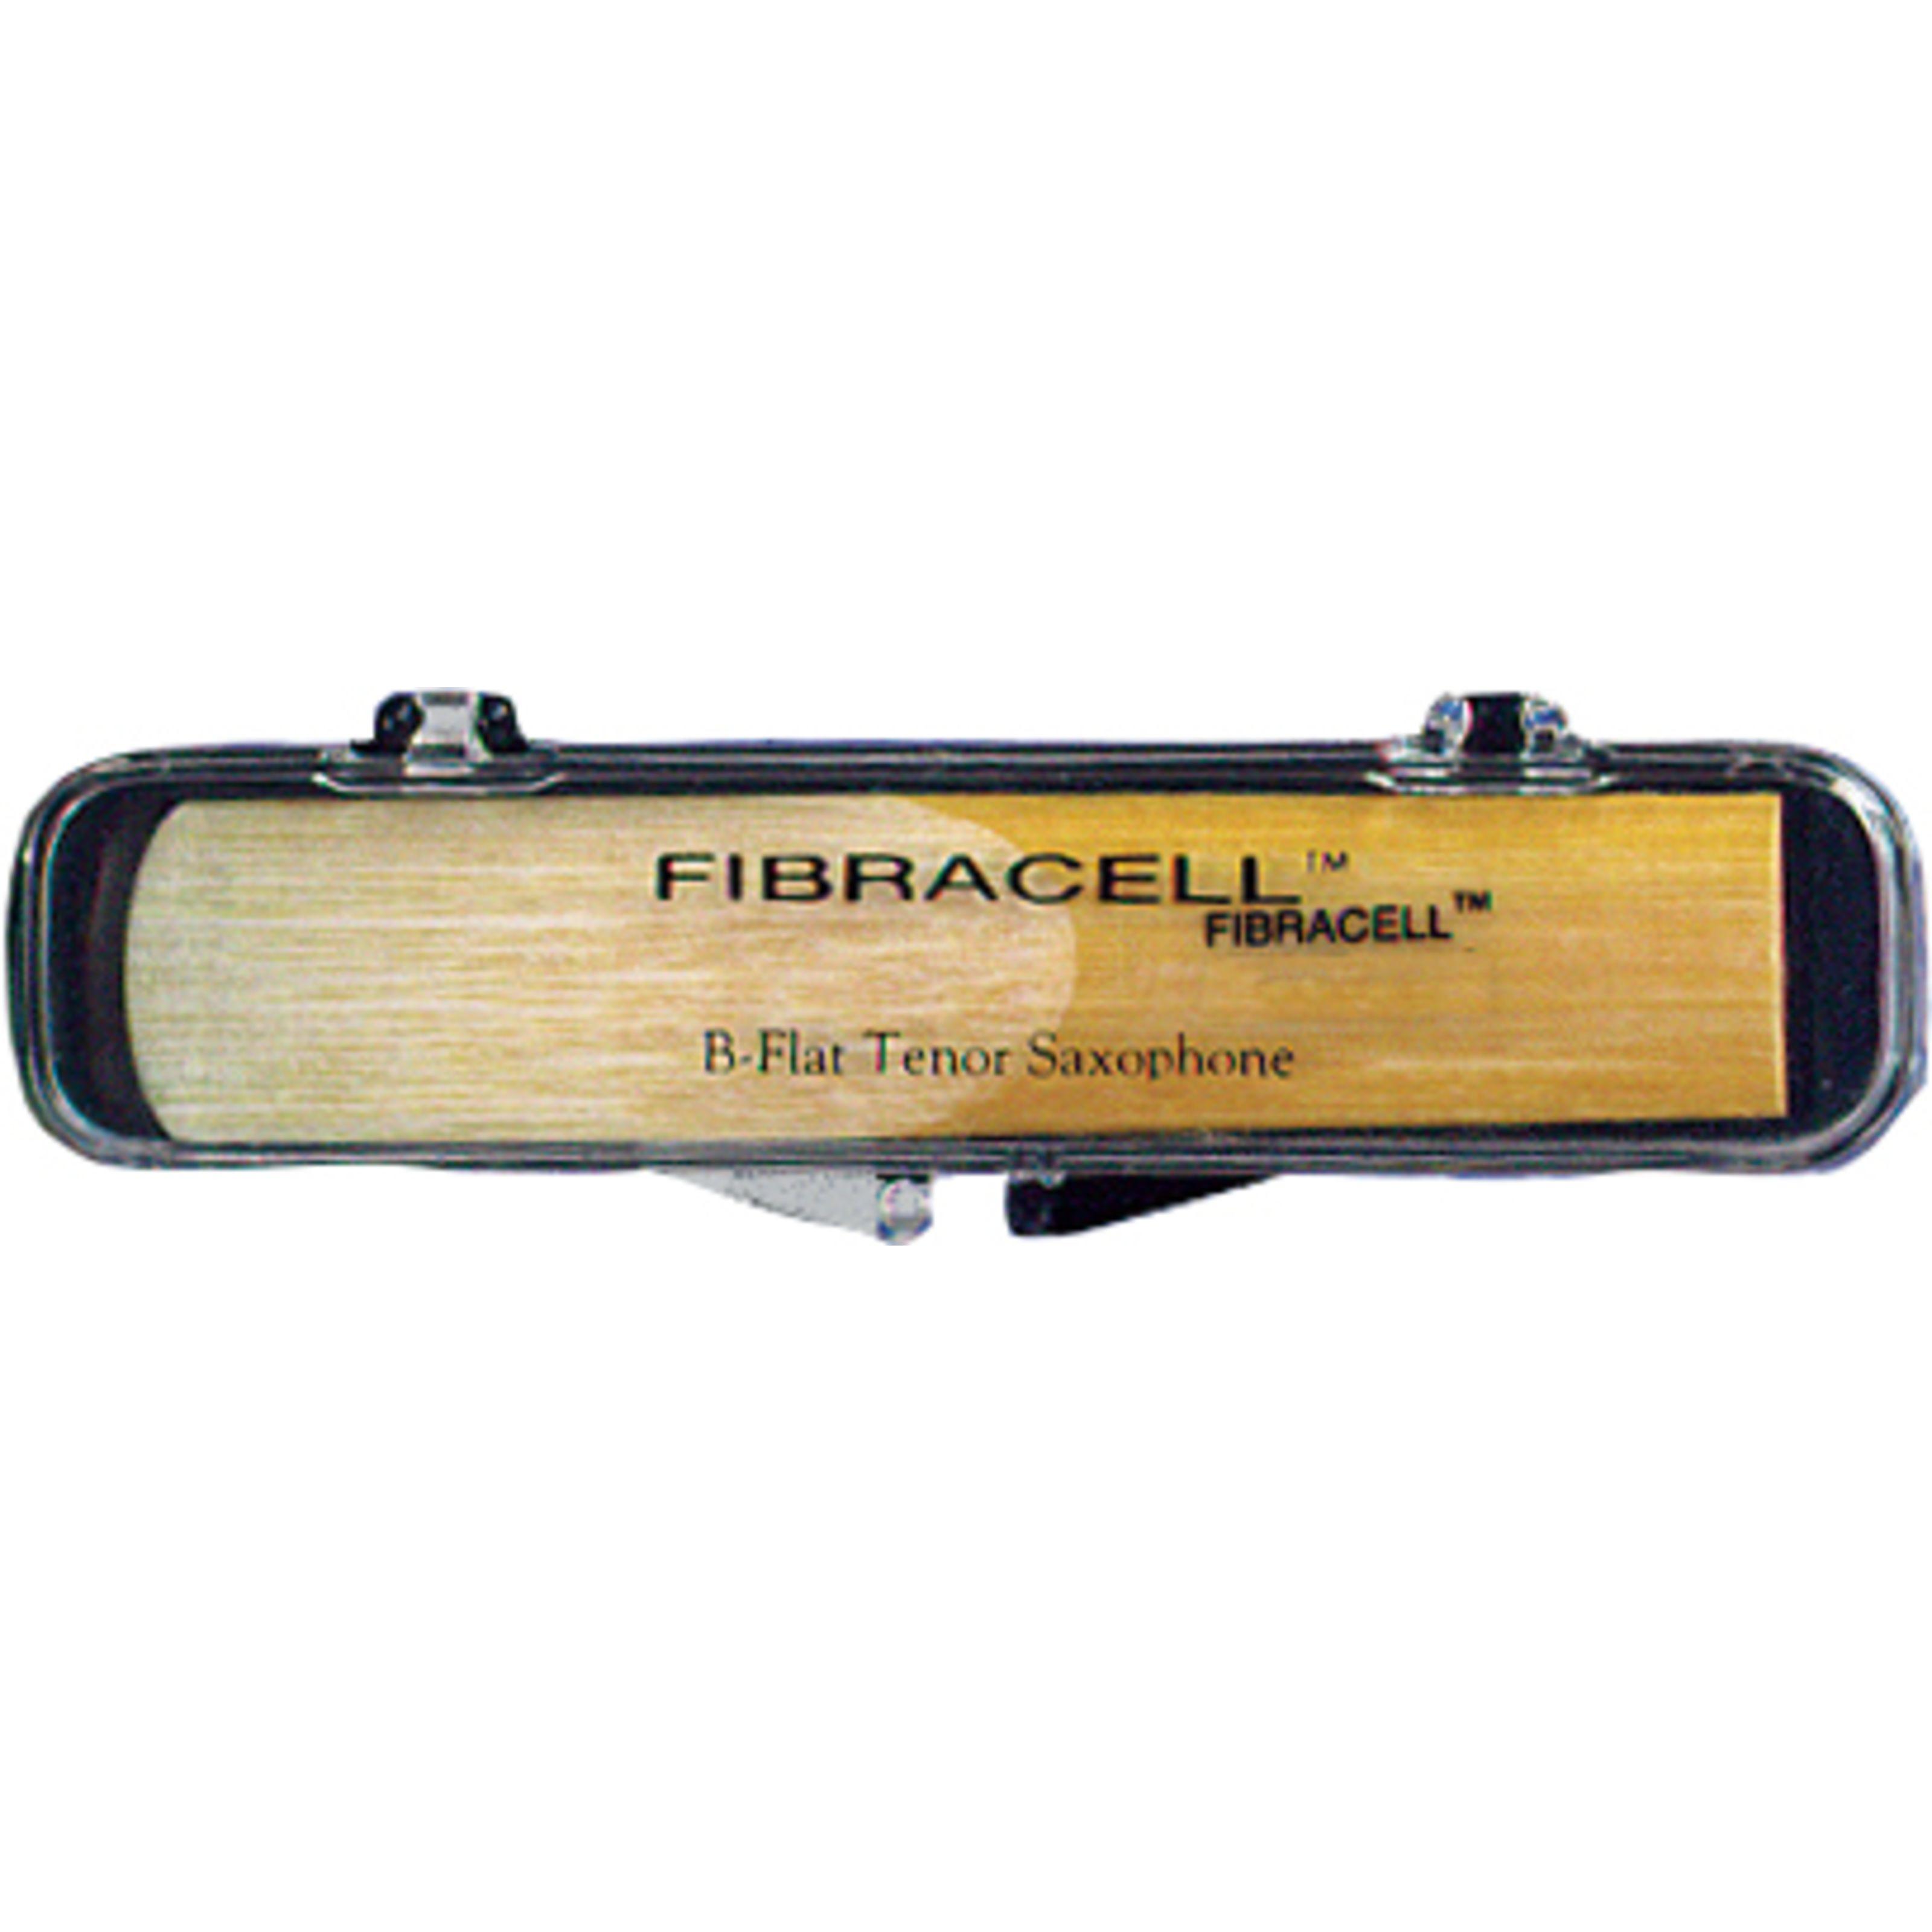 Fibracell - Premier Bb-Klarinette 2 für Boehm Klarinette